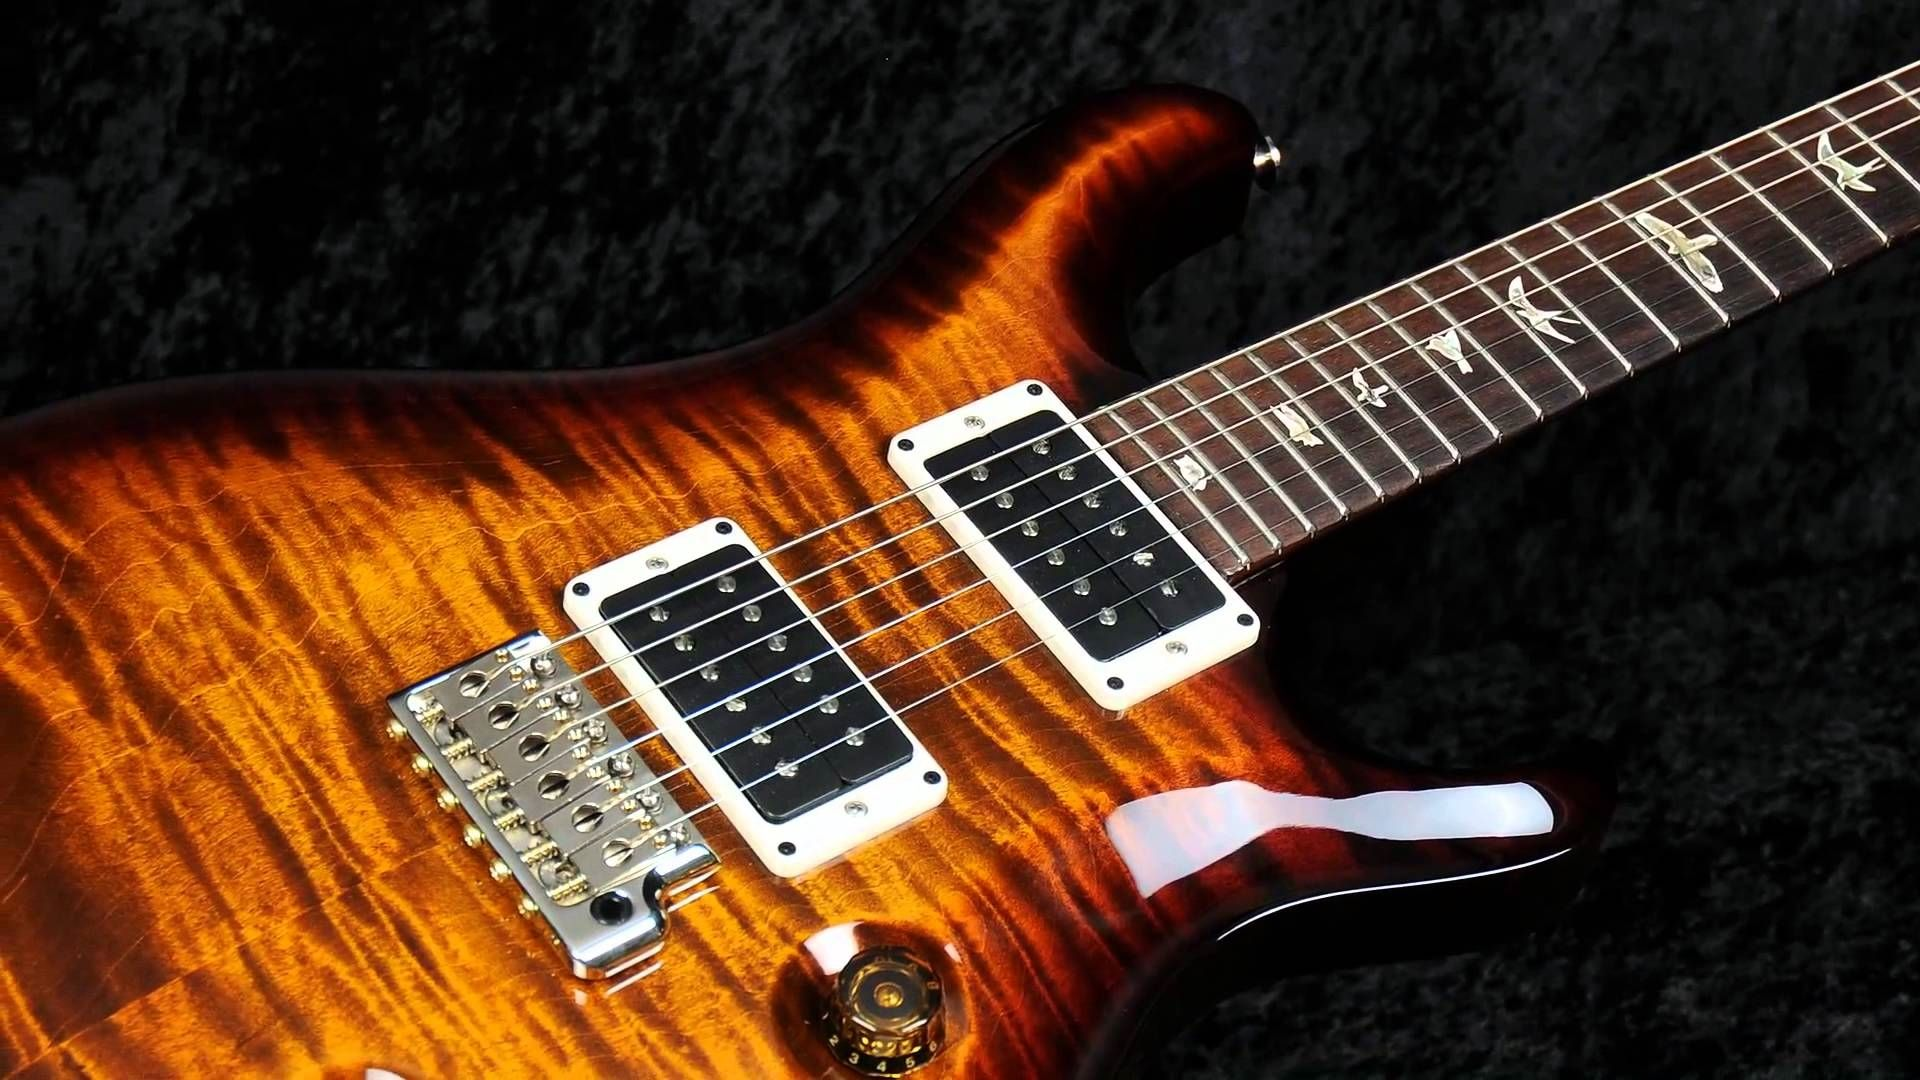 Fender Guitar, Cool Wallpaper